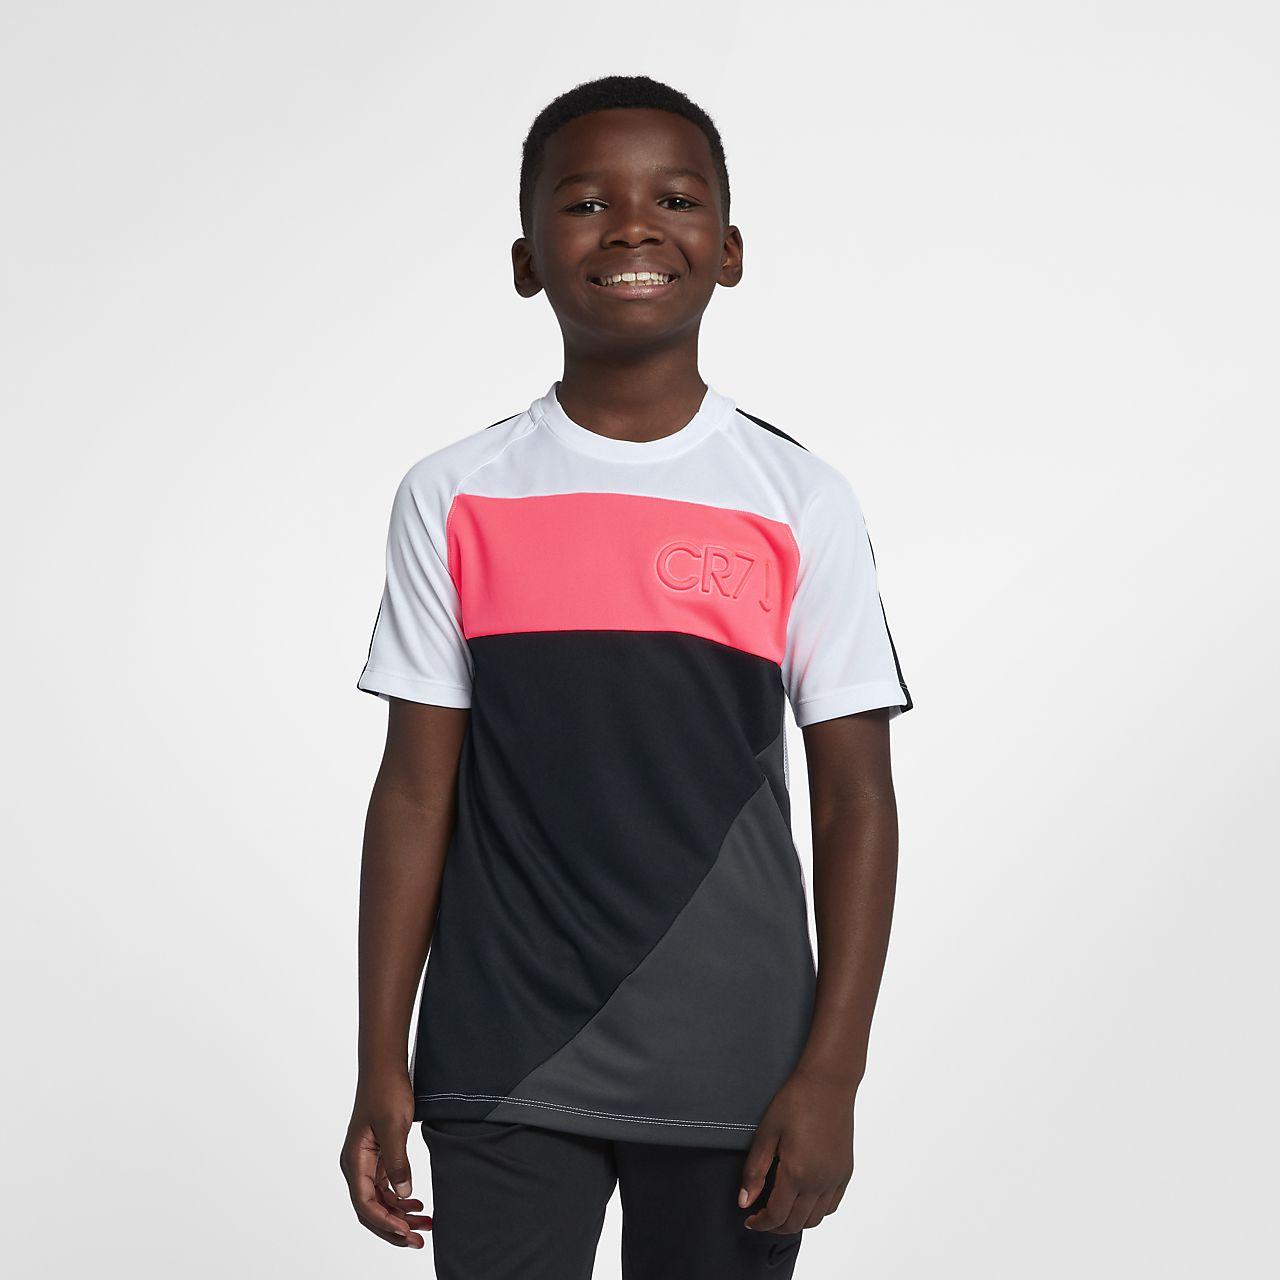 Camisola de futebol de manga curta Nike Dri-FIT CR7 Júnior (Rapaz ... fd7d4d673f160